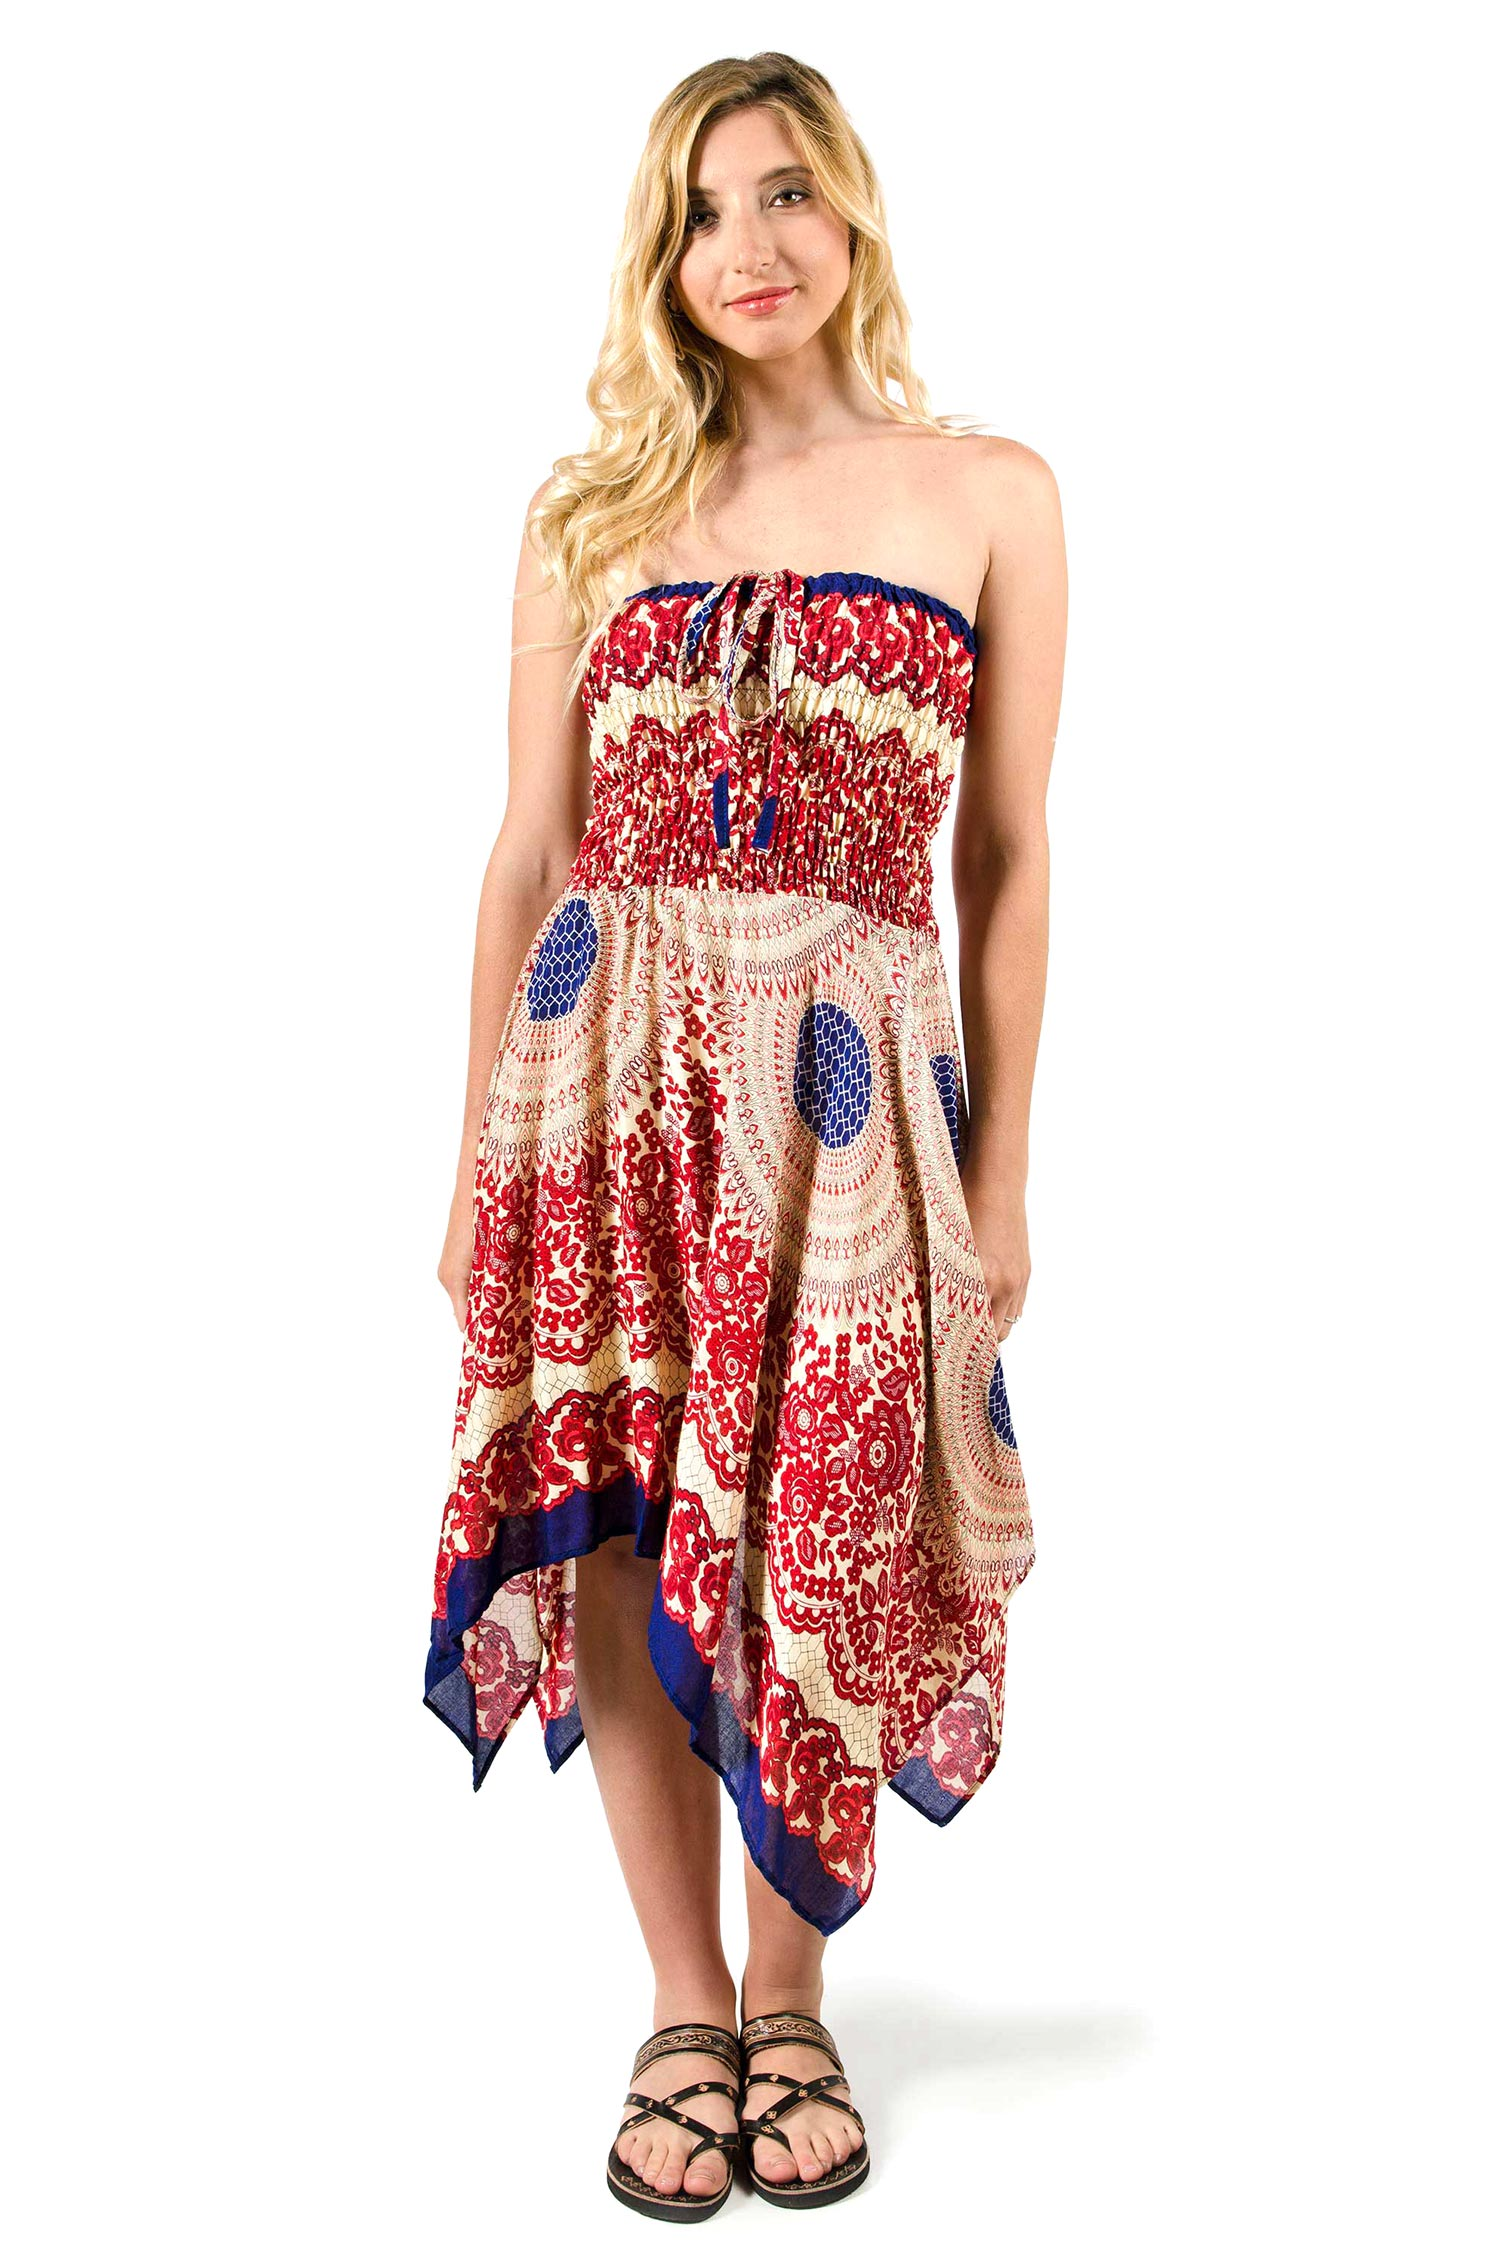 Convertible Print Fairy Dress / Skirt - Red - 3135R